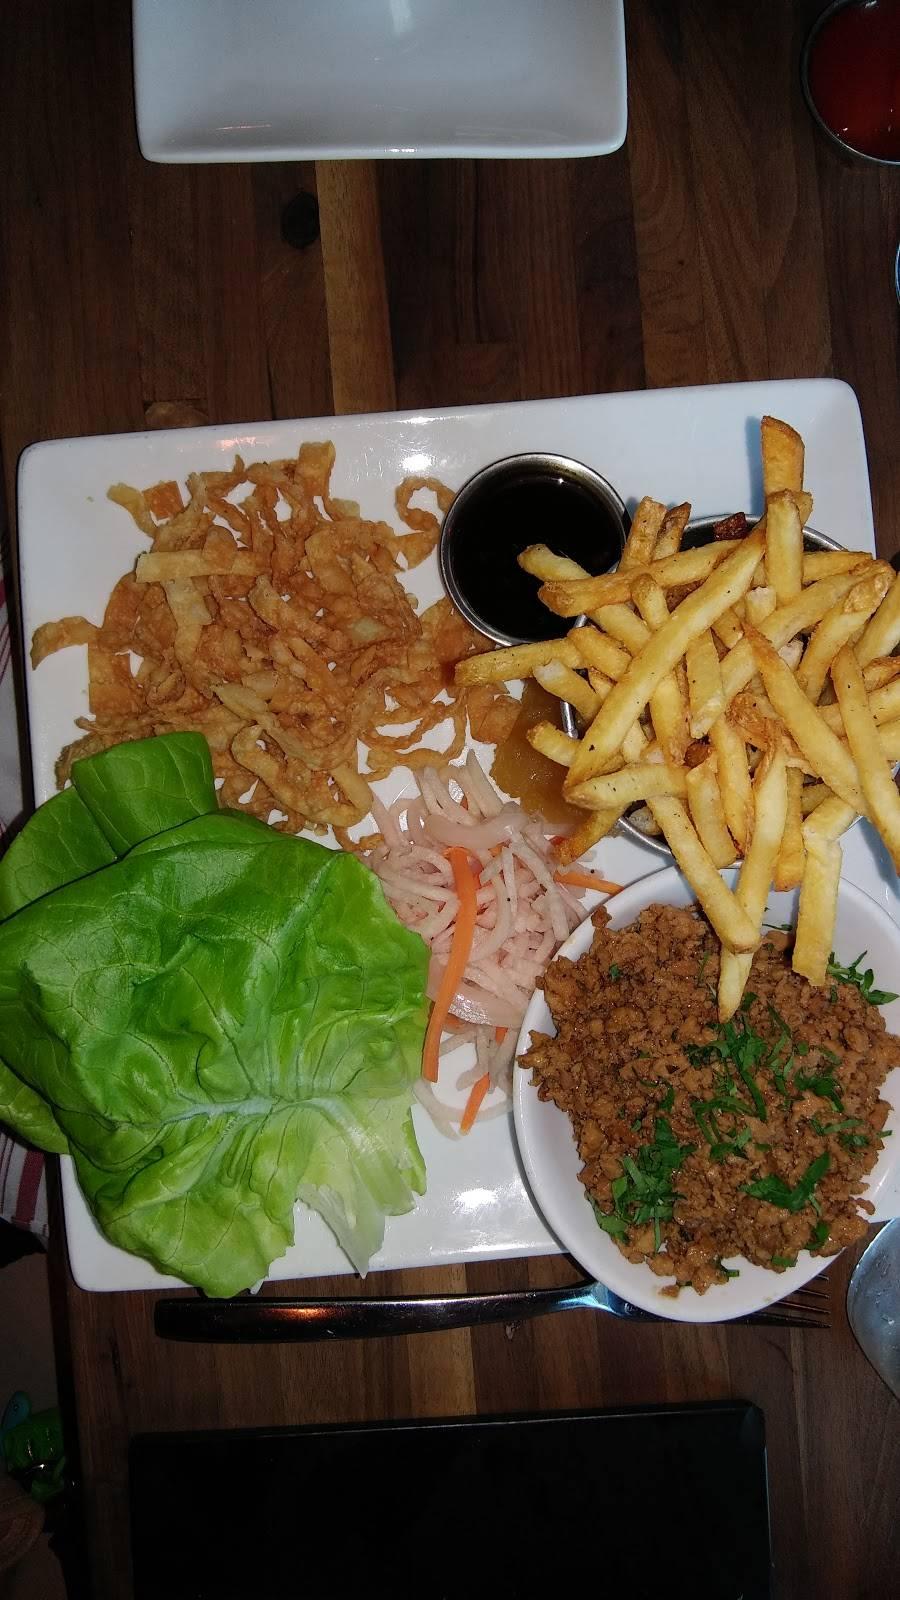 Market Place Kitchen & Bar | restaurant | 32 Church Hill Rd, Newtown, CT 06470, USA | 2034912993 OR +1 203-491-2993